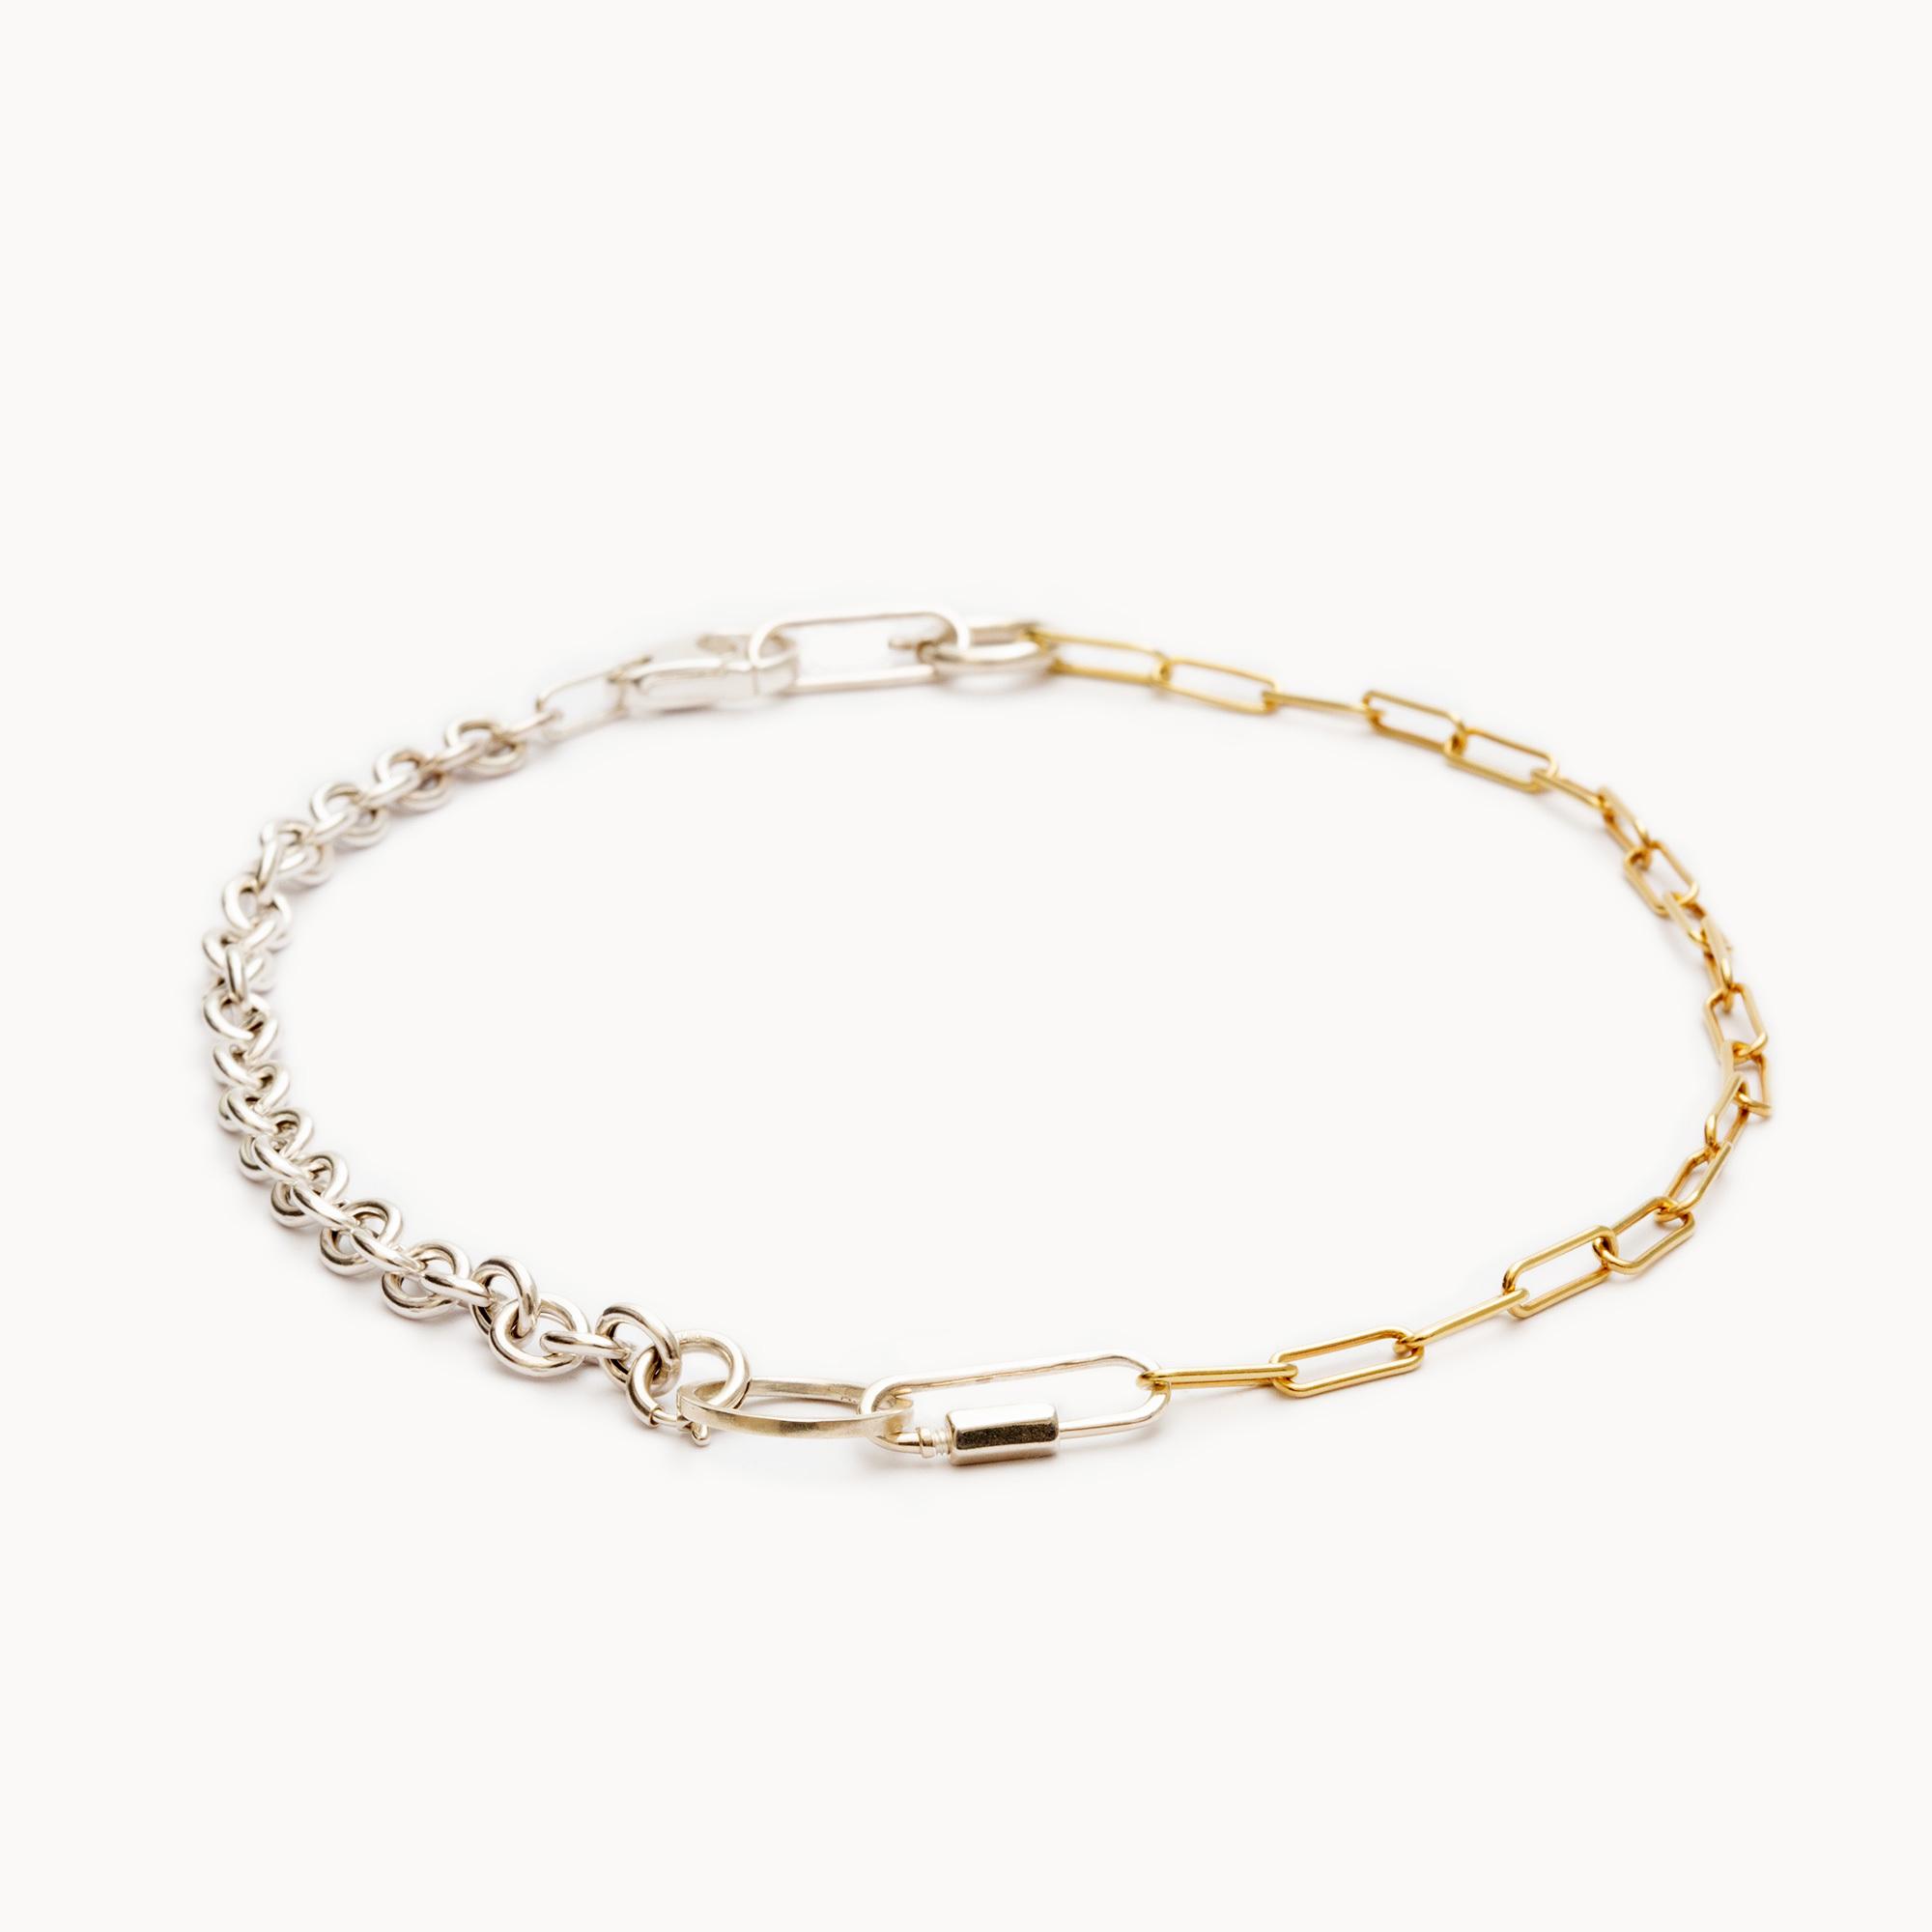 Necklace / Glasses Holder|ネックレス / グラスホルダー - art.1706N211012